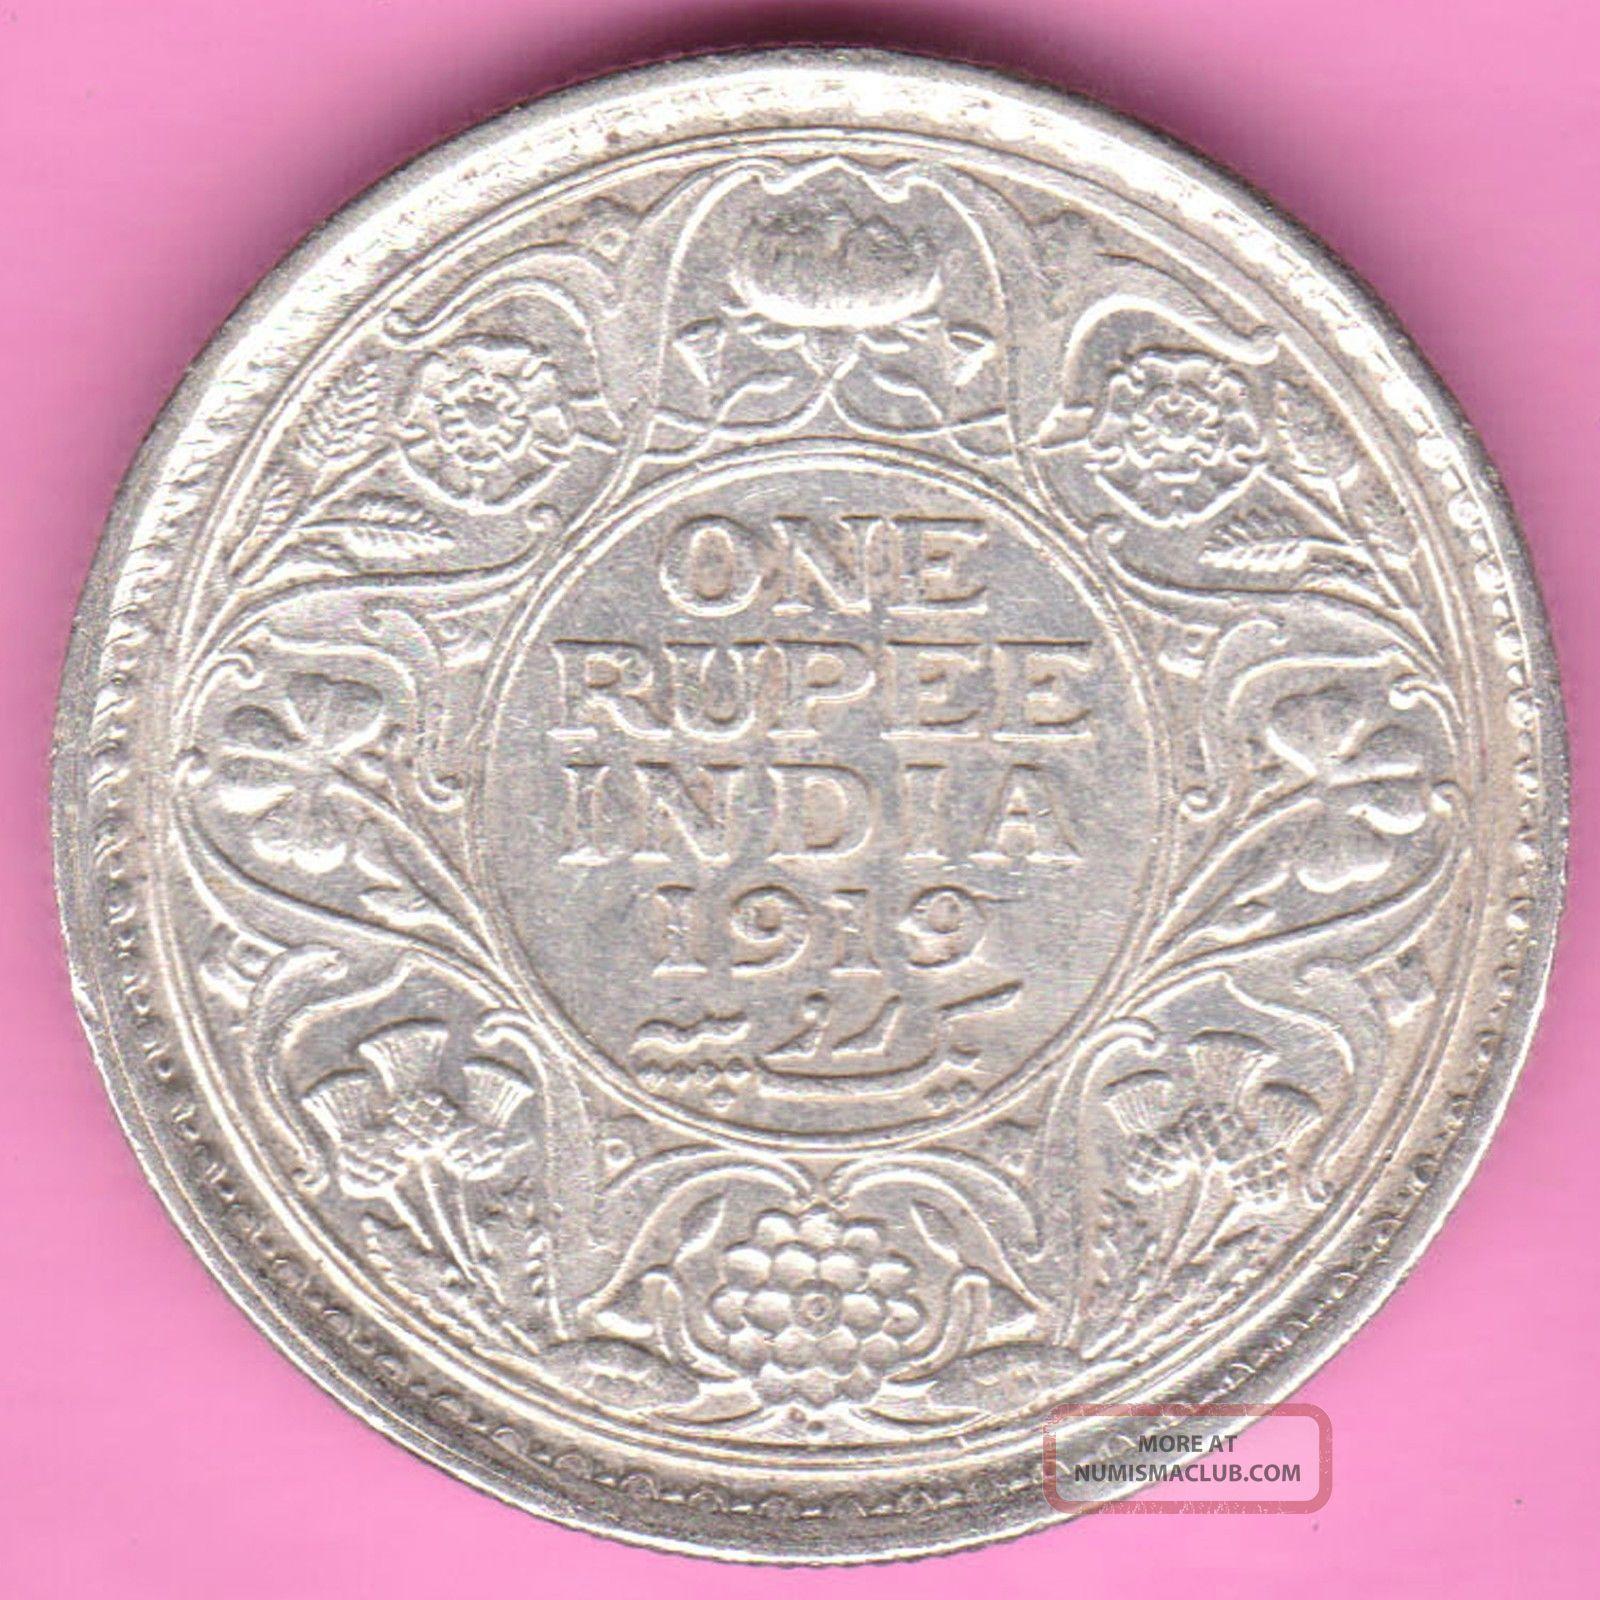 British India - 1919 - King George V - One Rupee - Rarest Silver Coin - 18 British photo